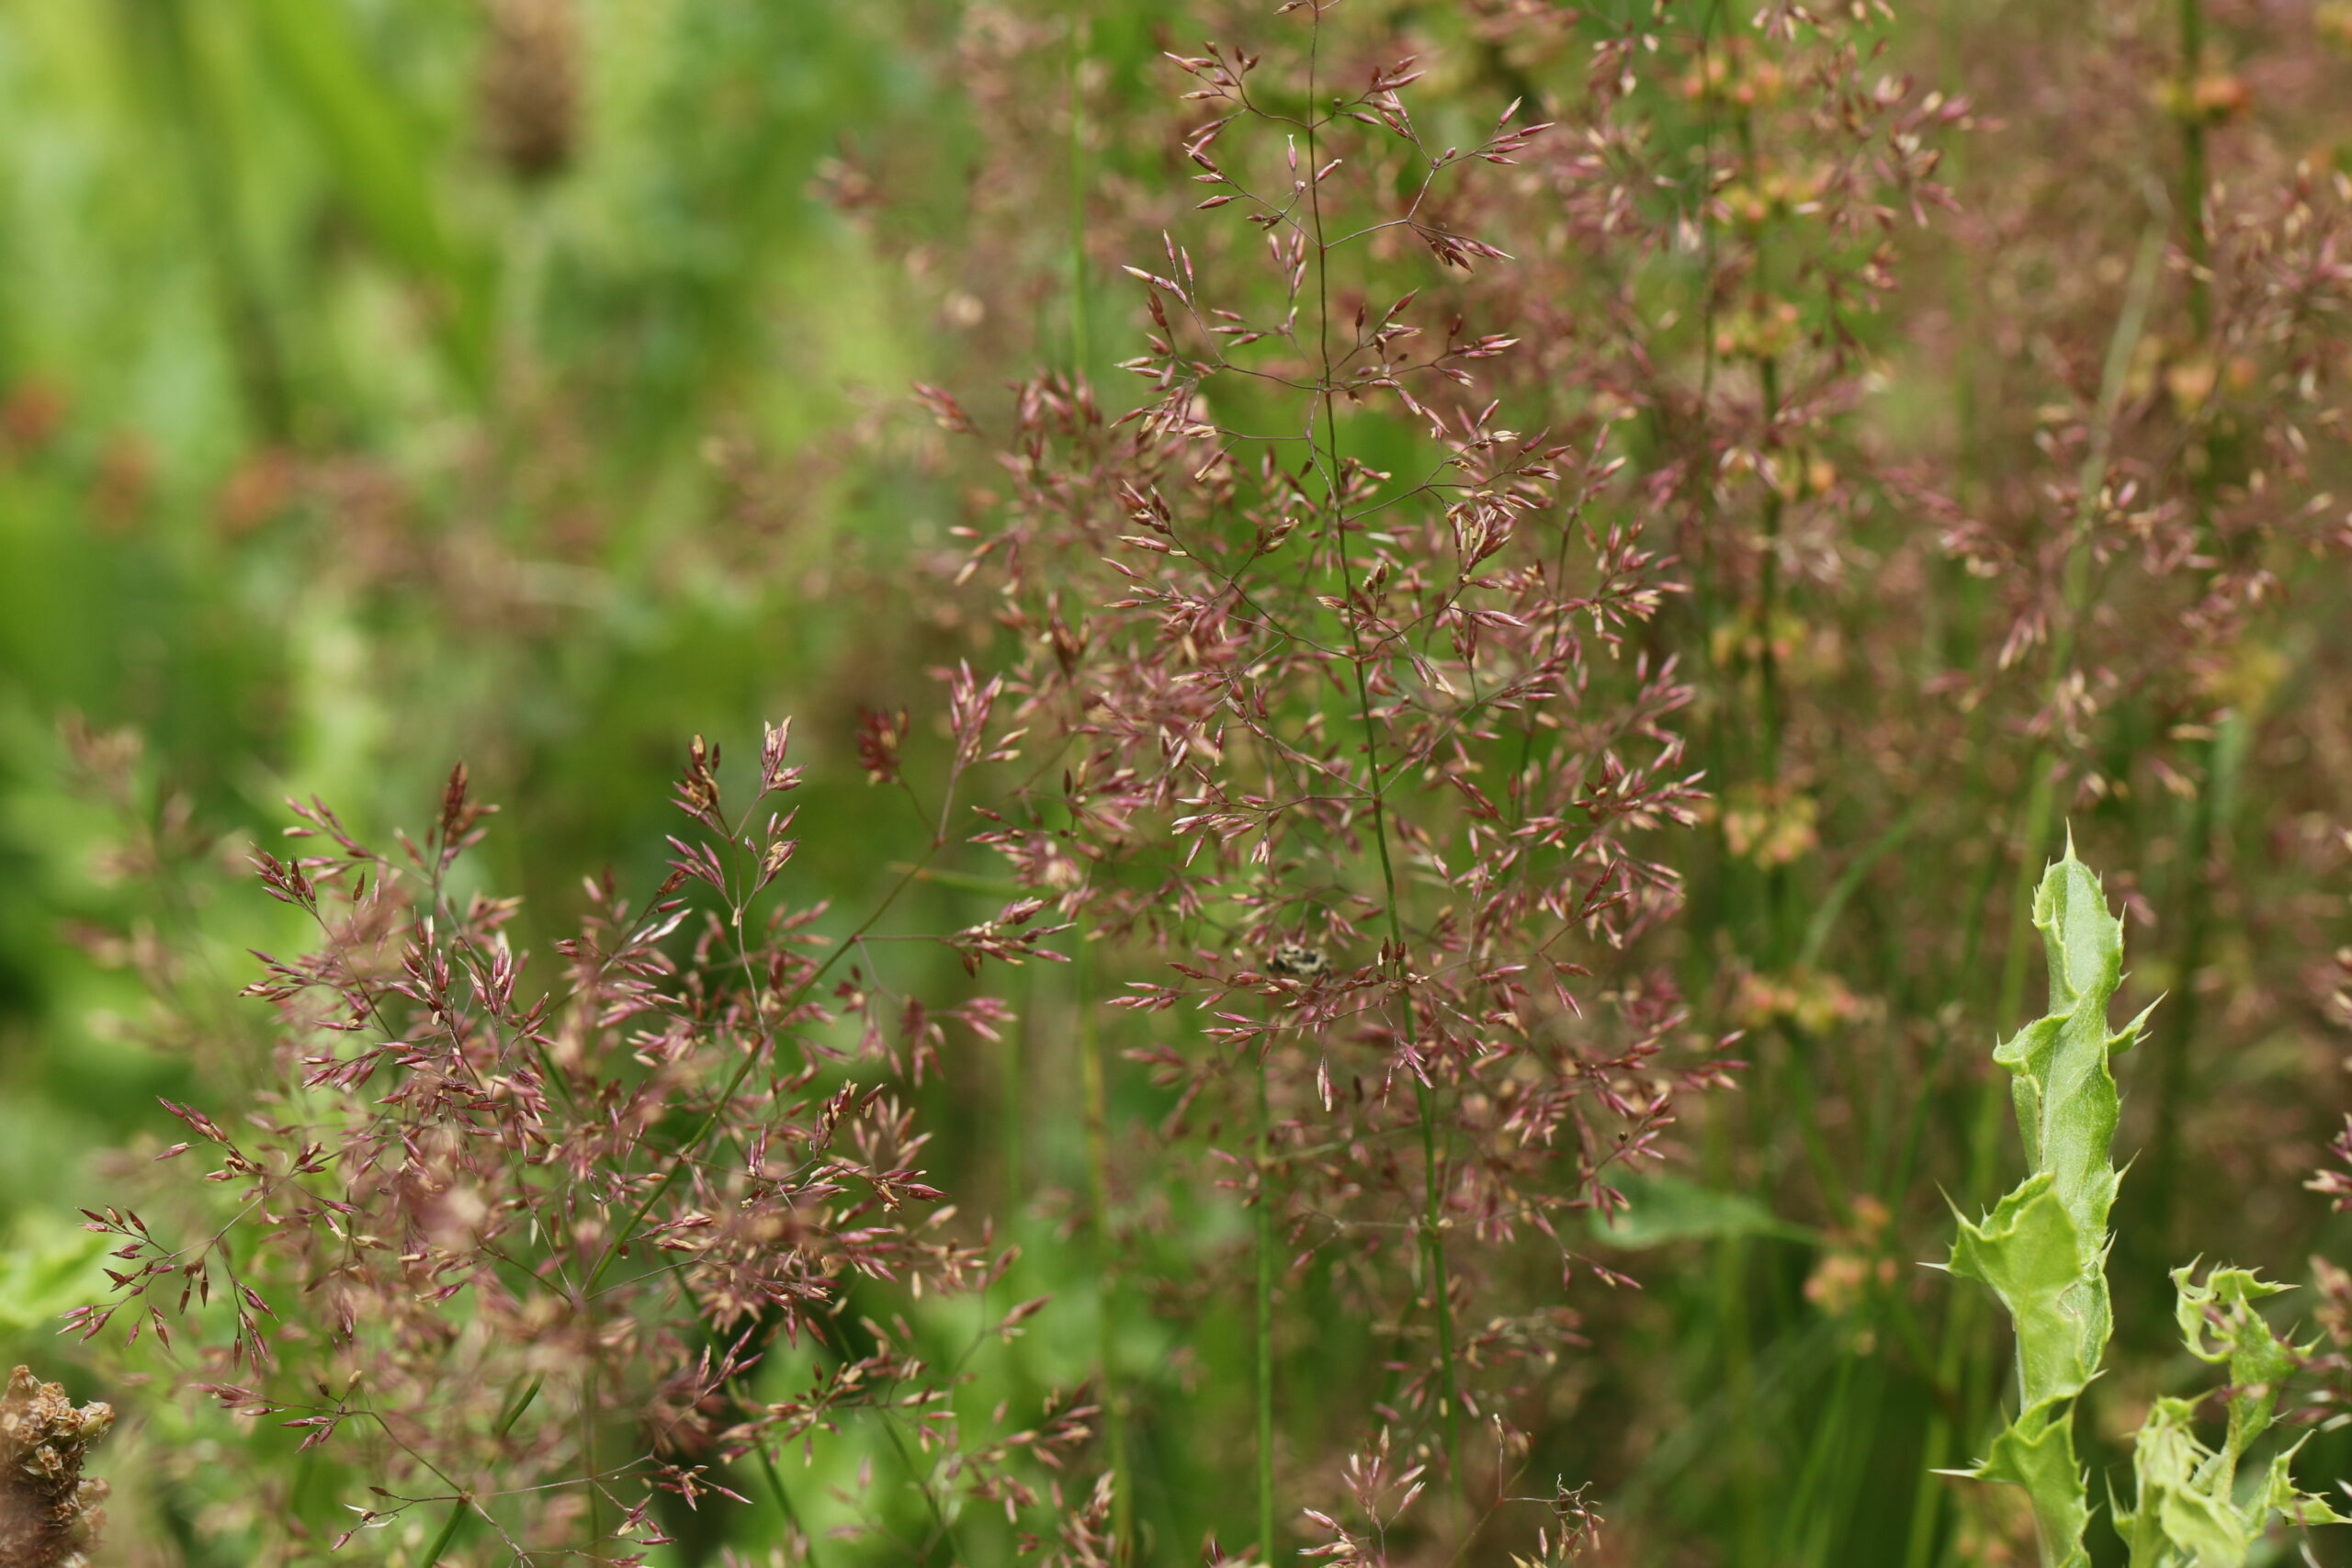 grassland, acid grassland